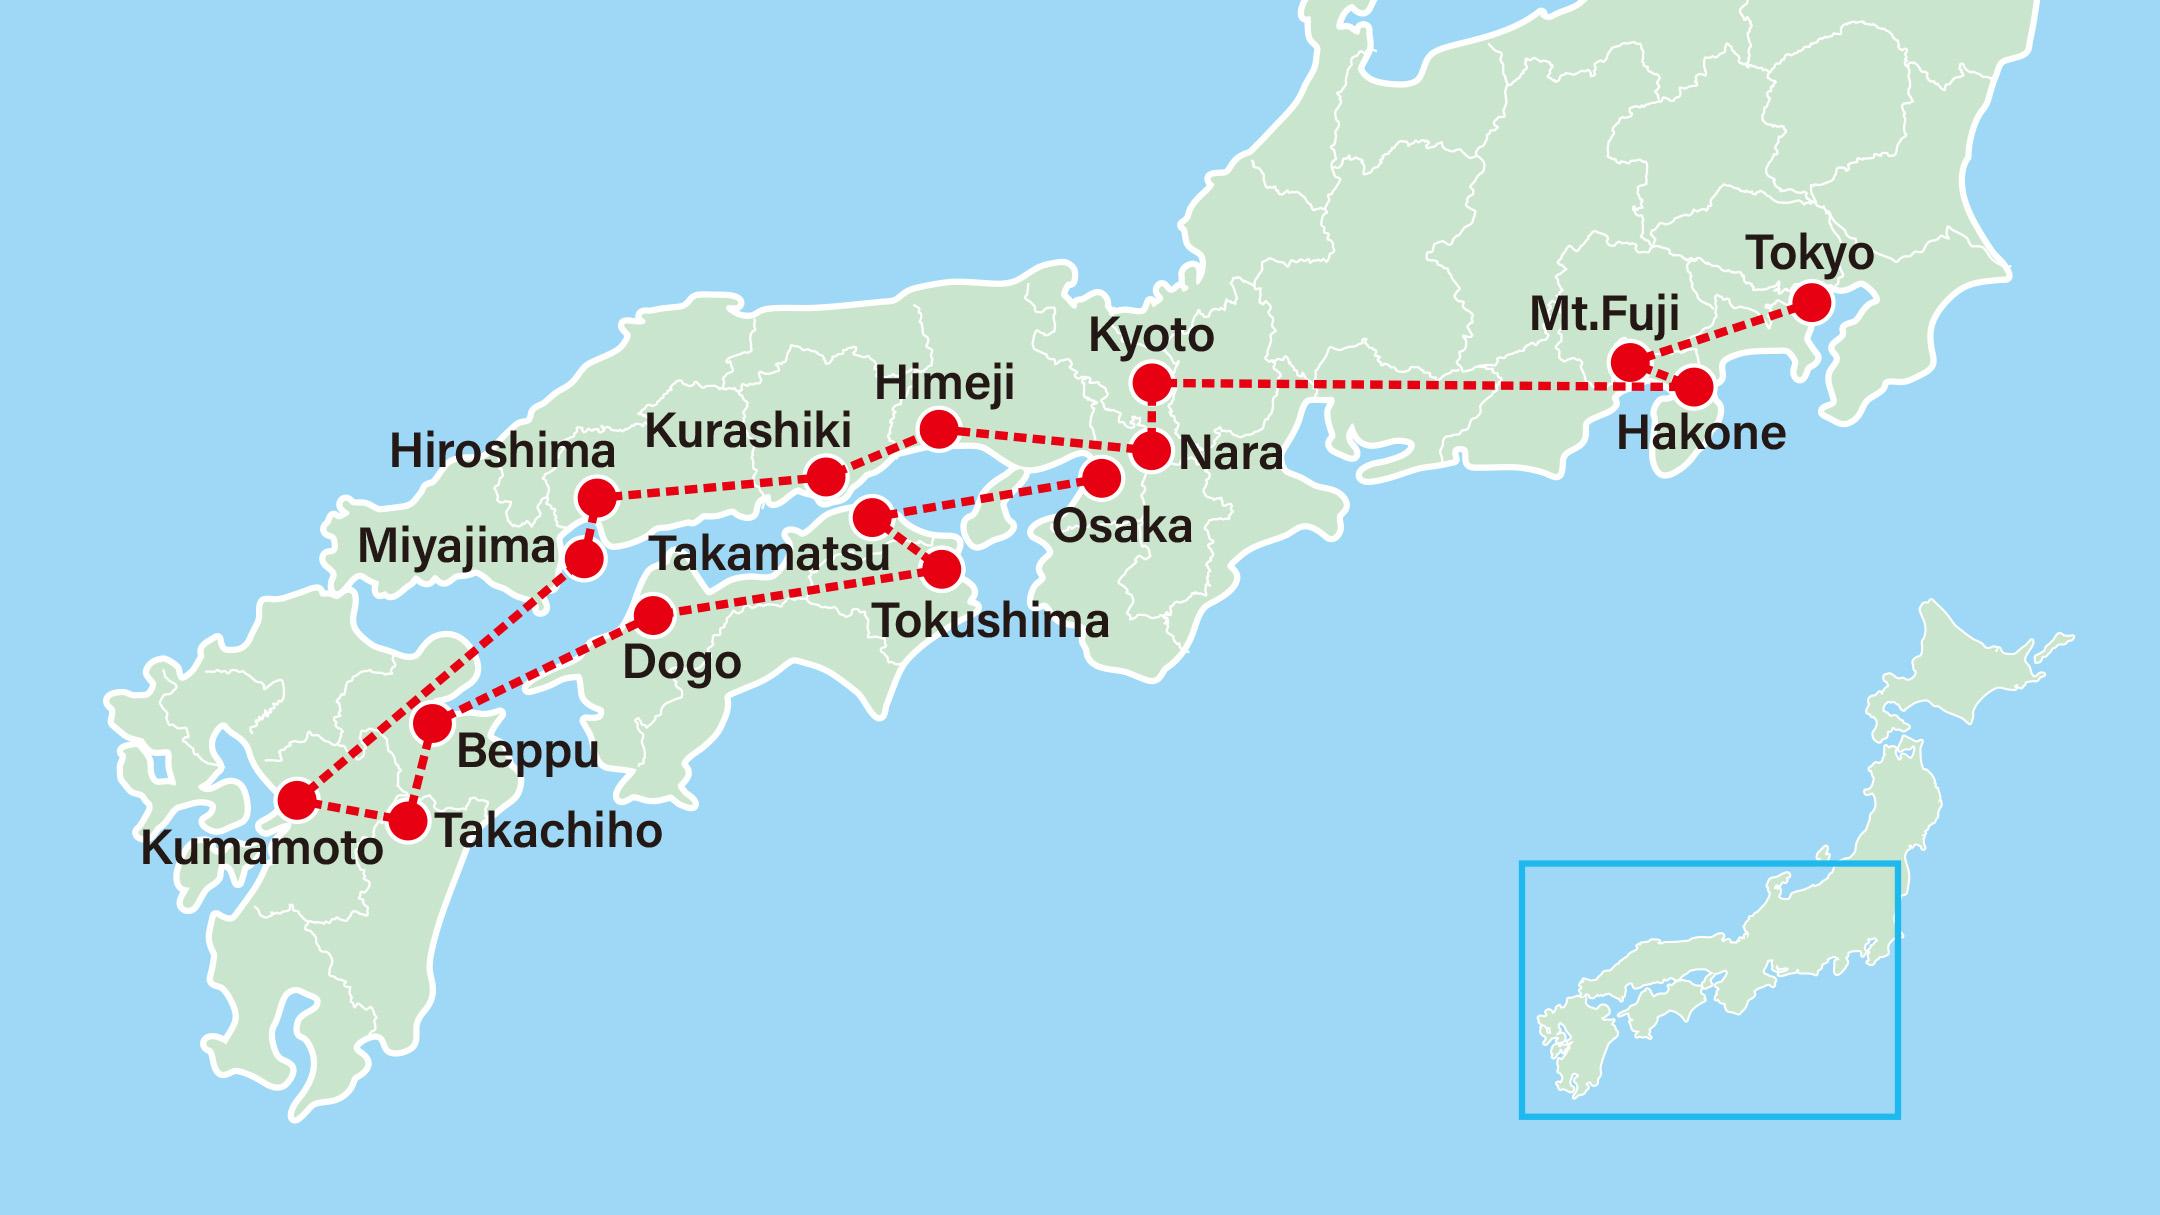 Grand Tour of Japan<br>13 Day Vacation-Considered the best season in Japan, travel cross-country during sakura season as you visit major cities like Hiroshima, Miyajima, Arita Ceramic Village, Nagasaki, Beppu, Matsuyama, Osaka, Nara, Kyoto, Hakone, Mt. Fuji, and Tokyo.